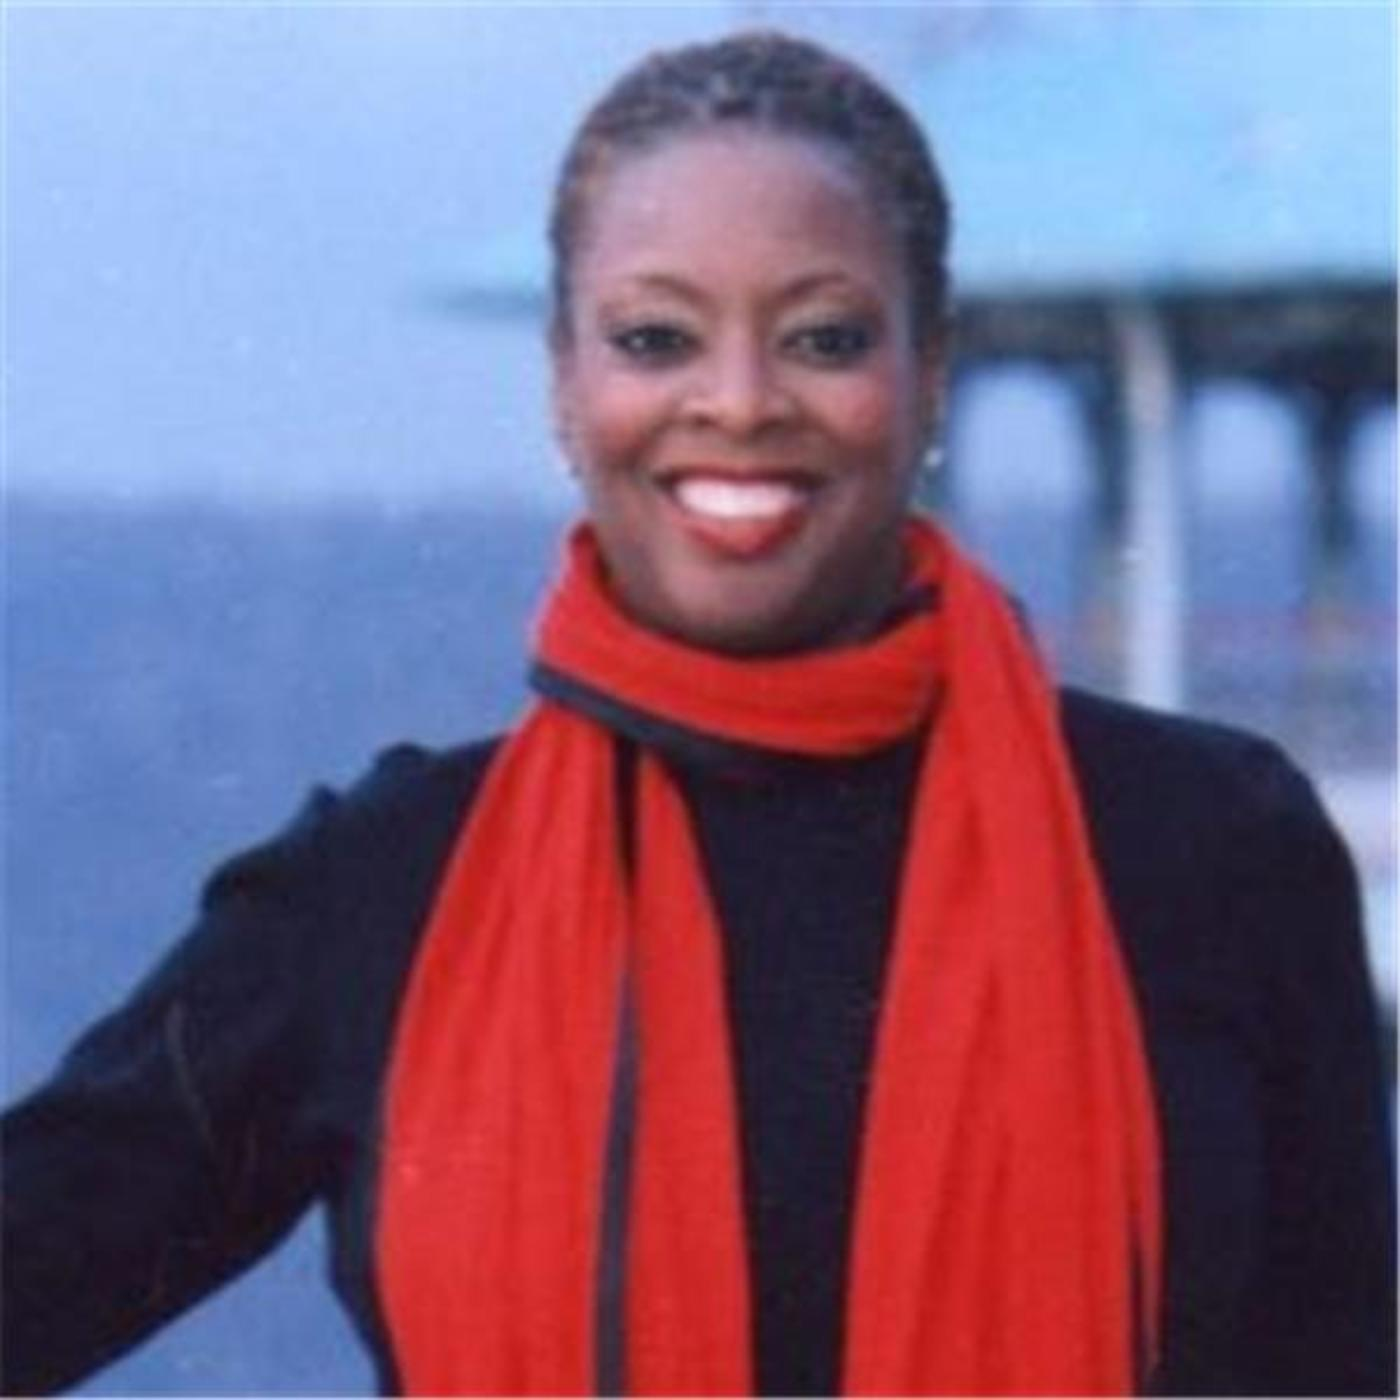 The Avon Motivational Radio Show:Patricia McDow